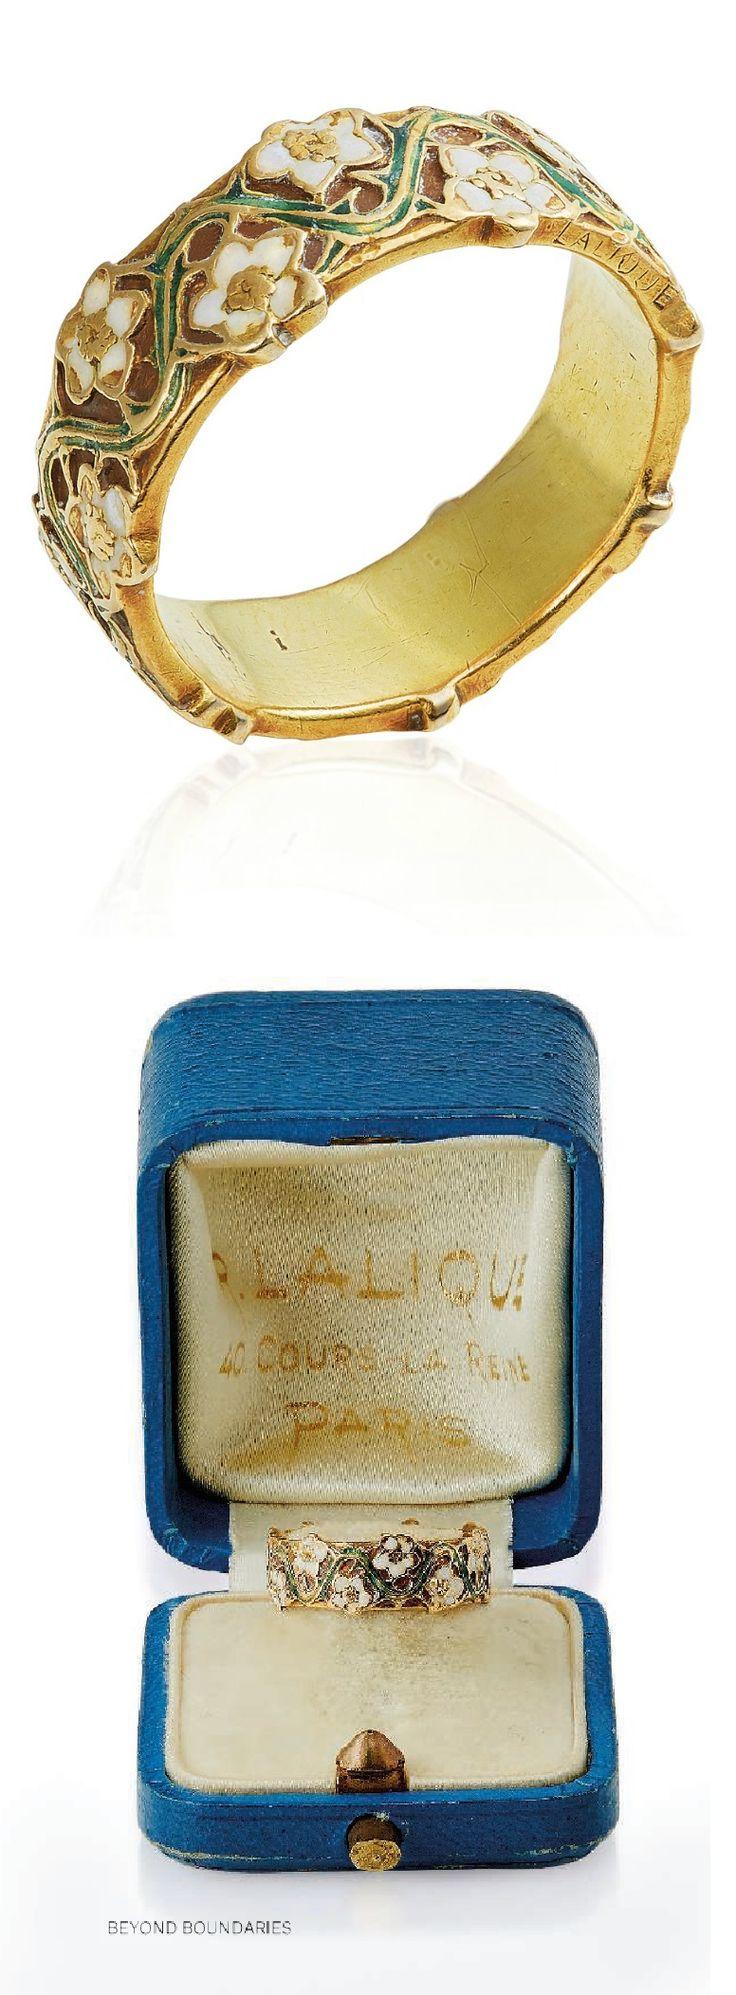 RENÉ LALIQUE – EIN ART NOUVEAU-EMAILLE-BANDRING, UM 1900. Die Goldband-Verfolgungsjagd …